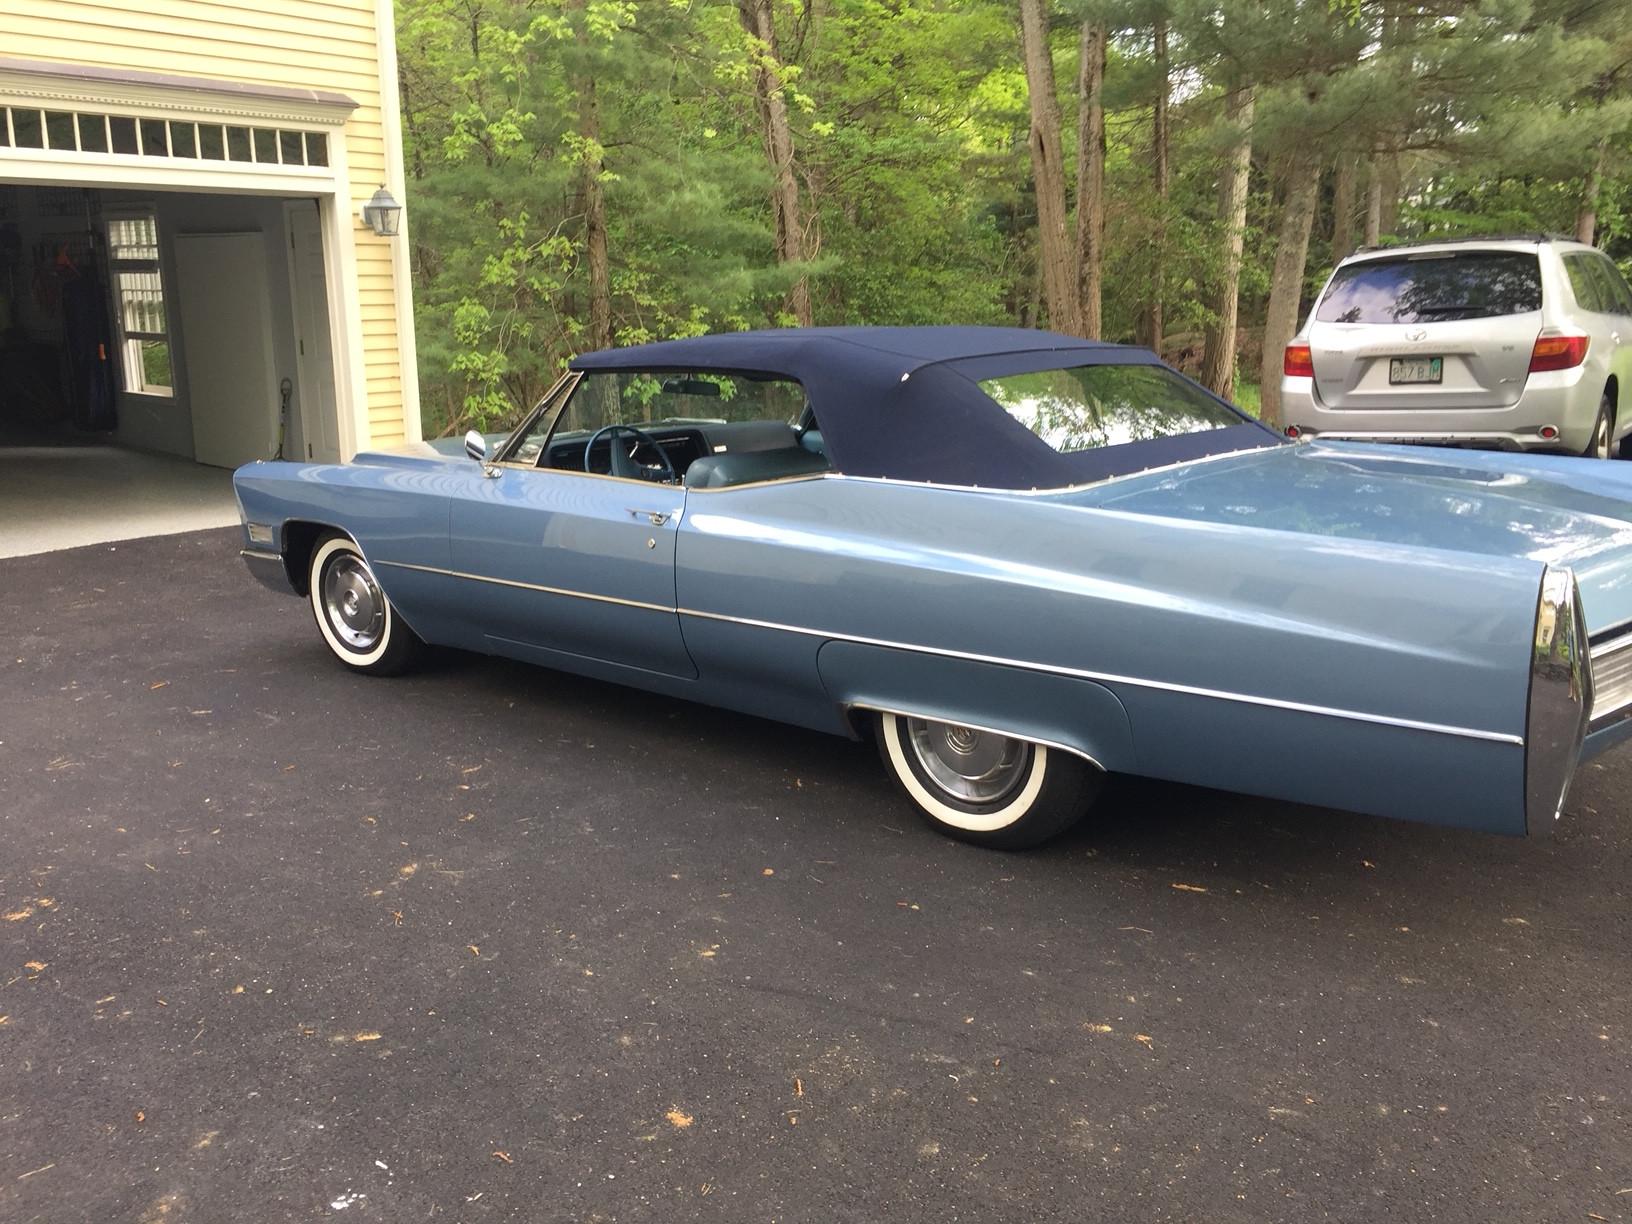 Cadillac Coupe Deville Convertible Hire Needham